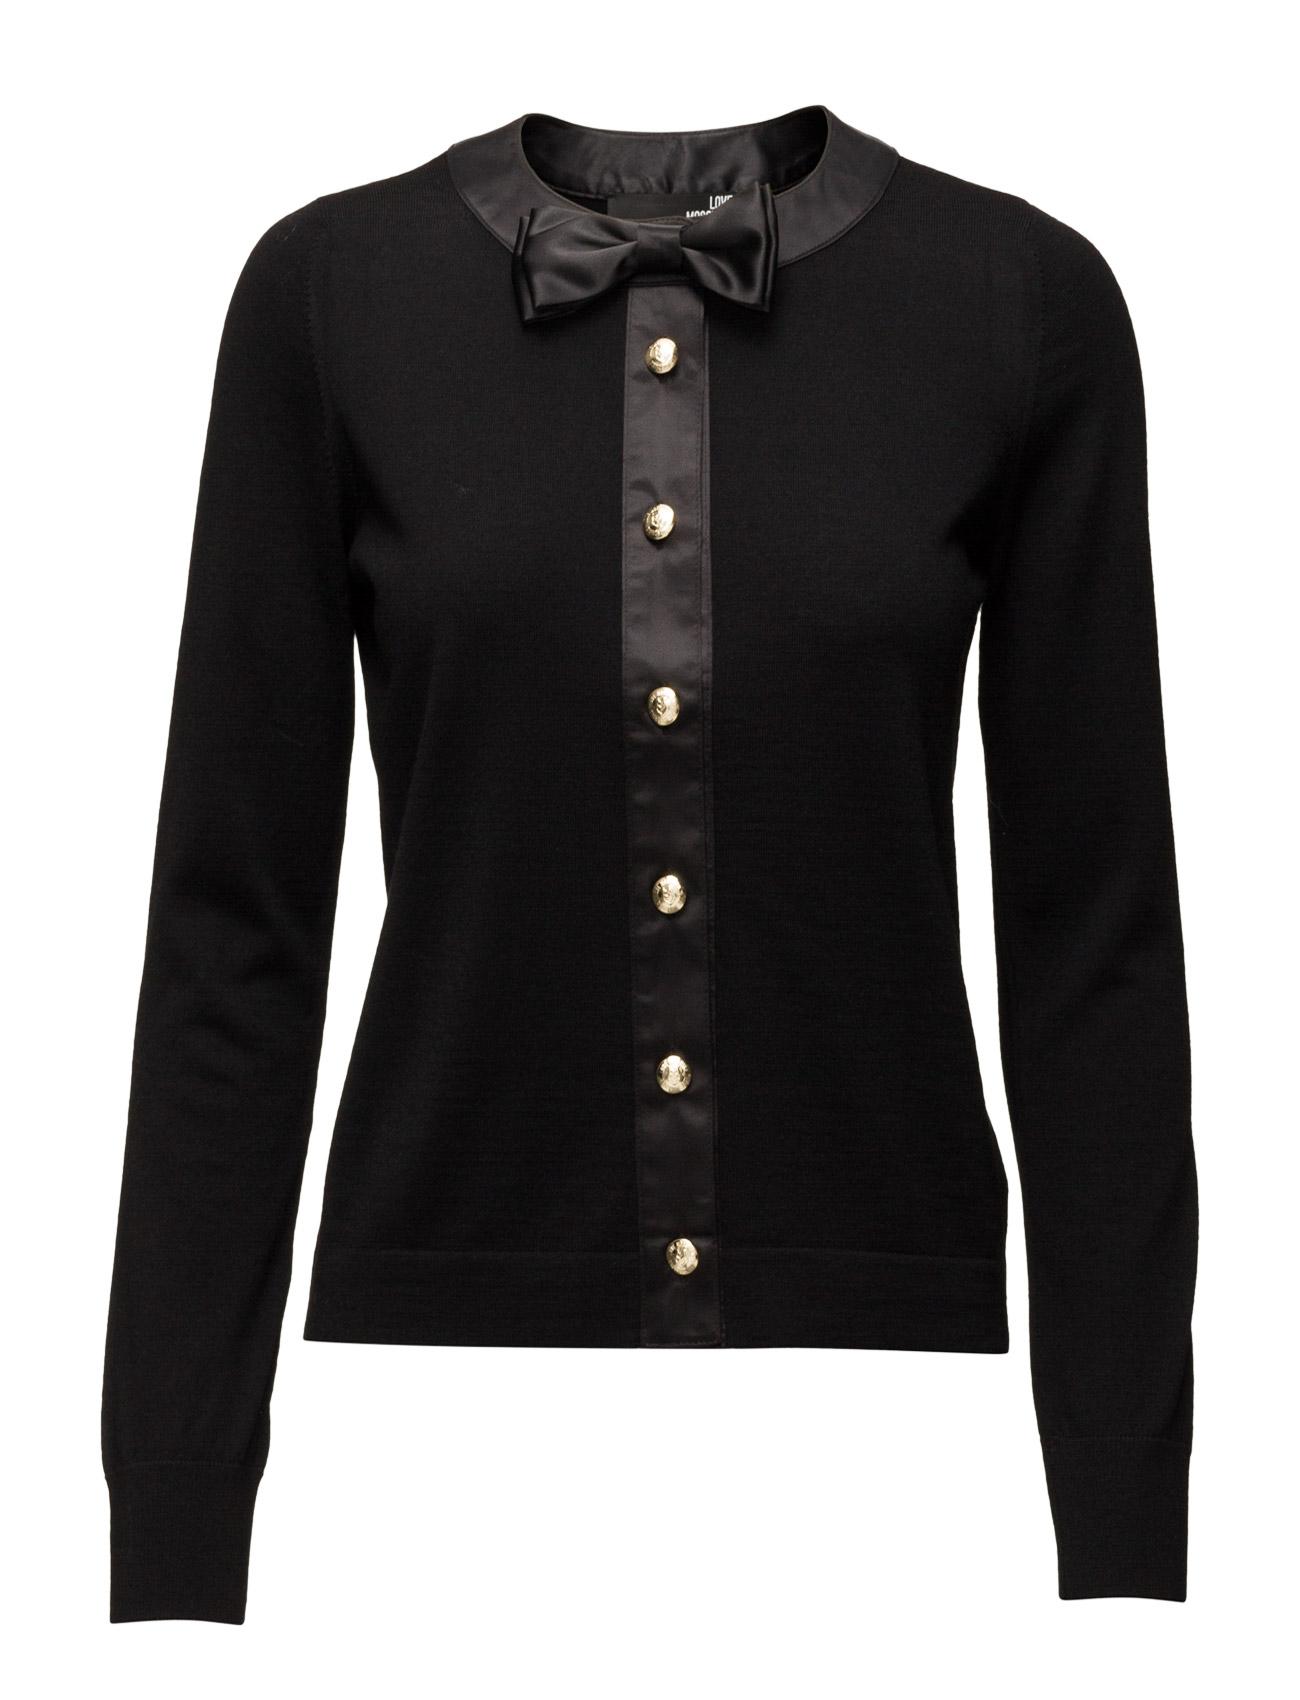 Love Moschino-Jacket Love Moschino Striktøj til Kvinder i Sort